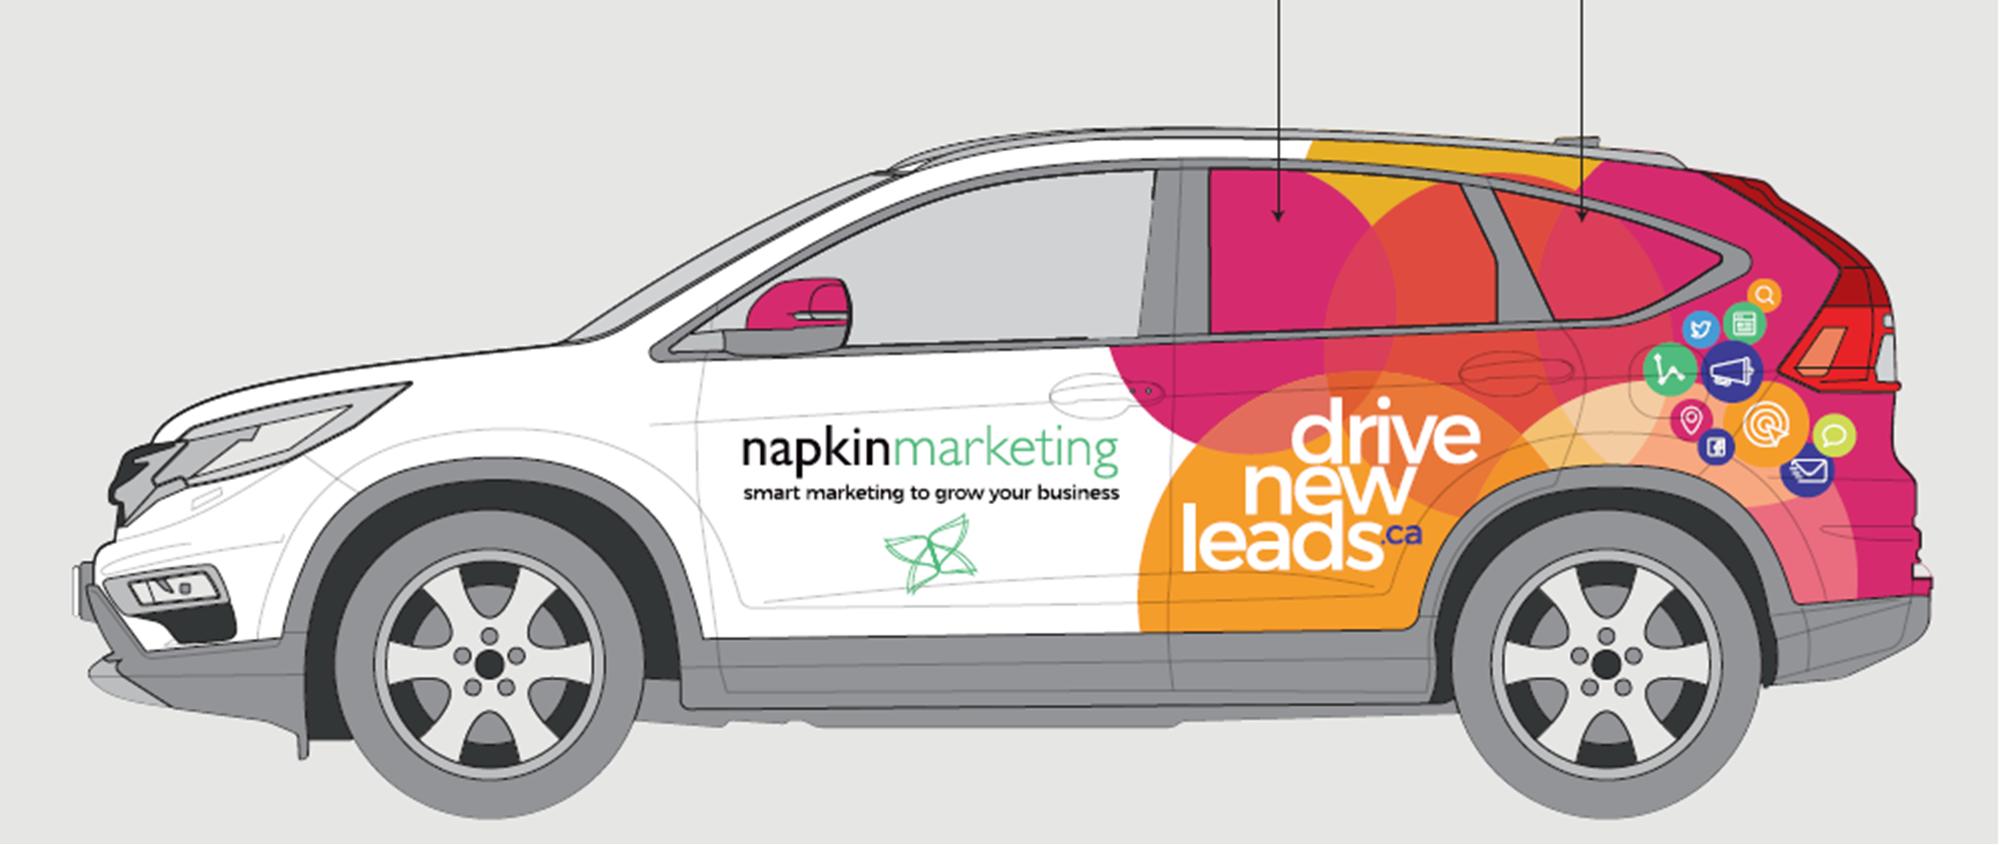 drive-new-leads-car-1